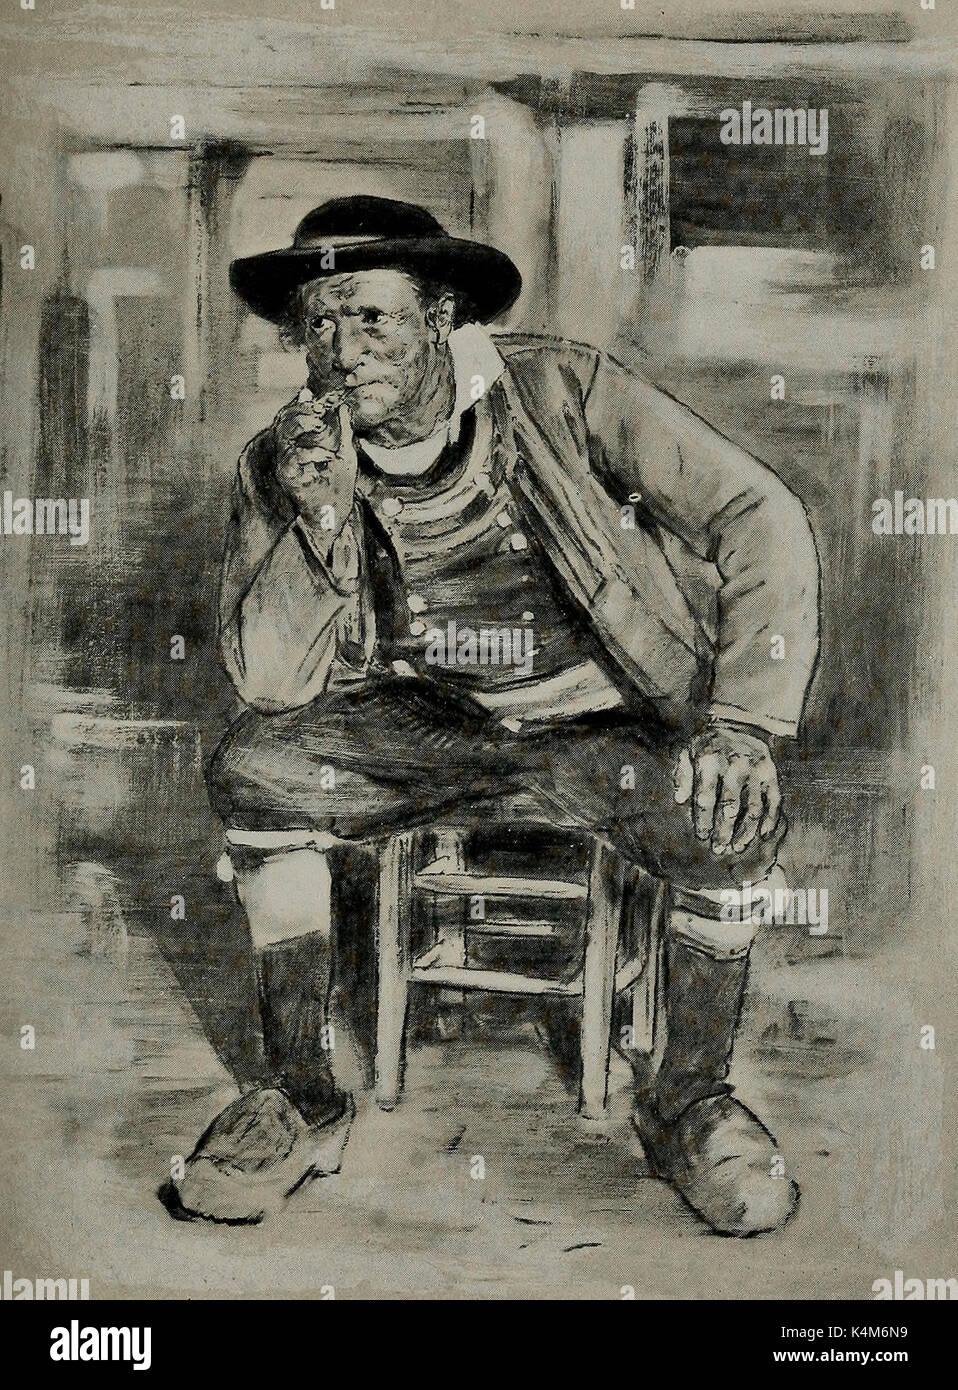 A Breton Peasant, circa 1900 - Stock Image